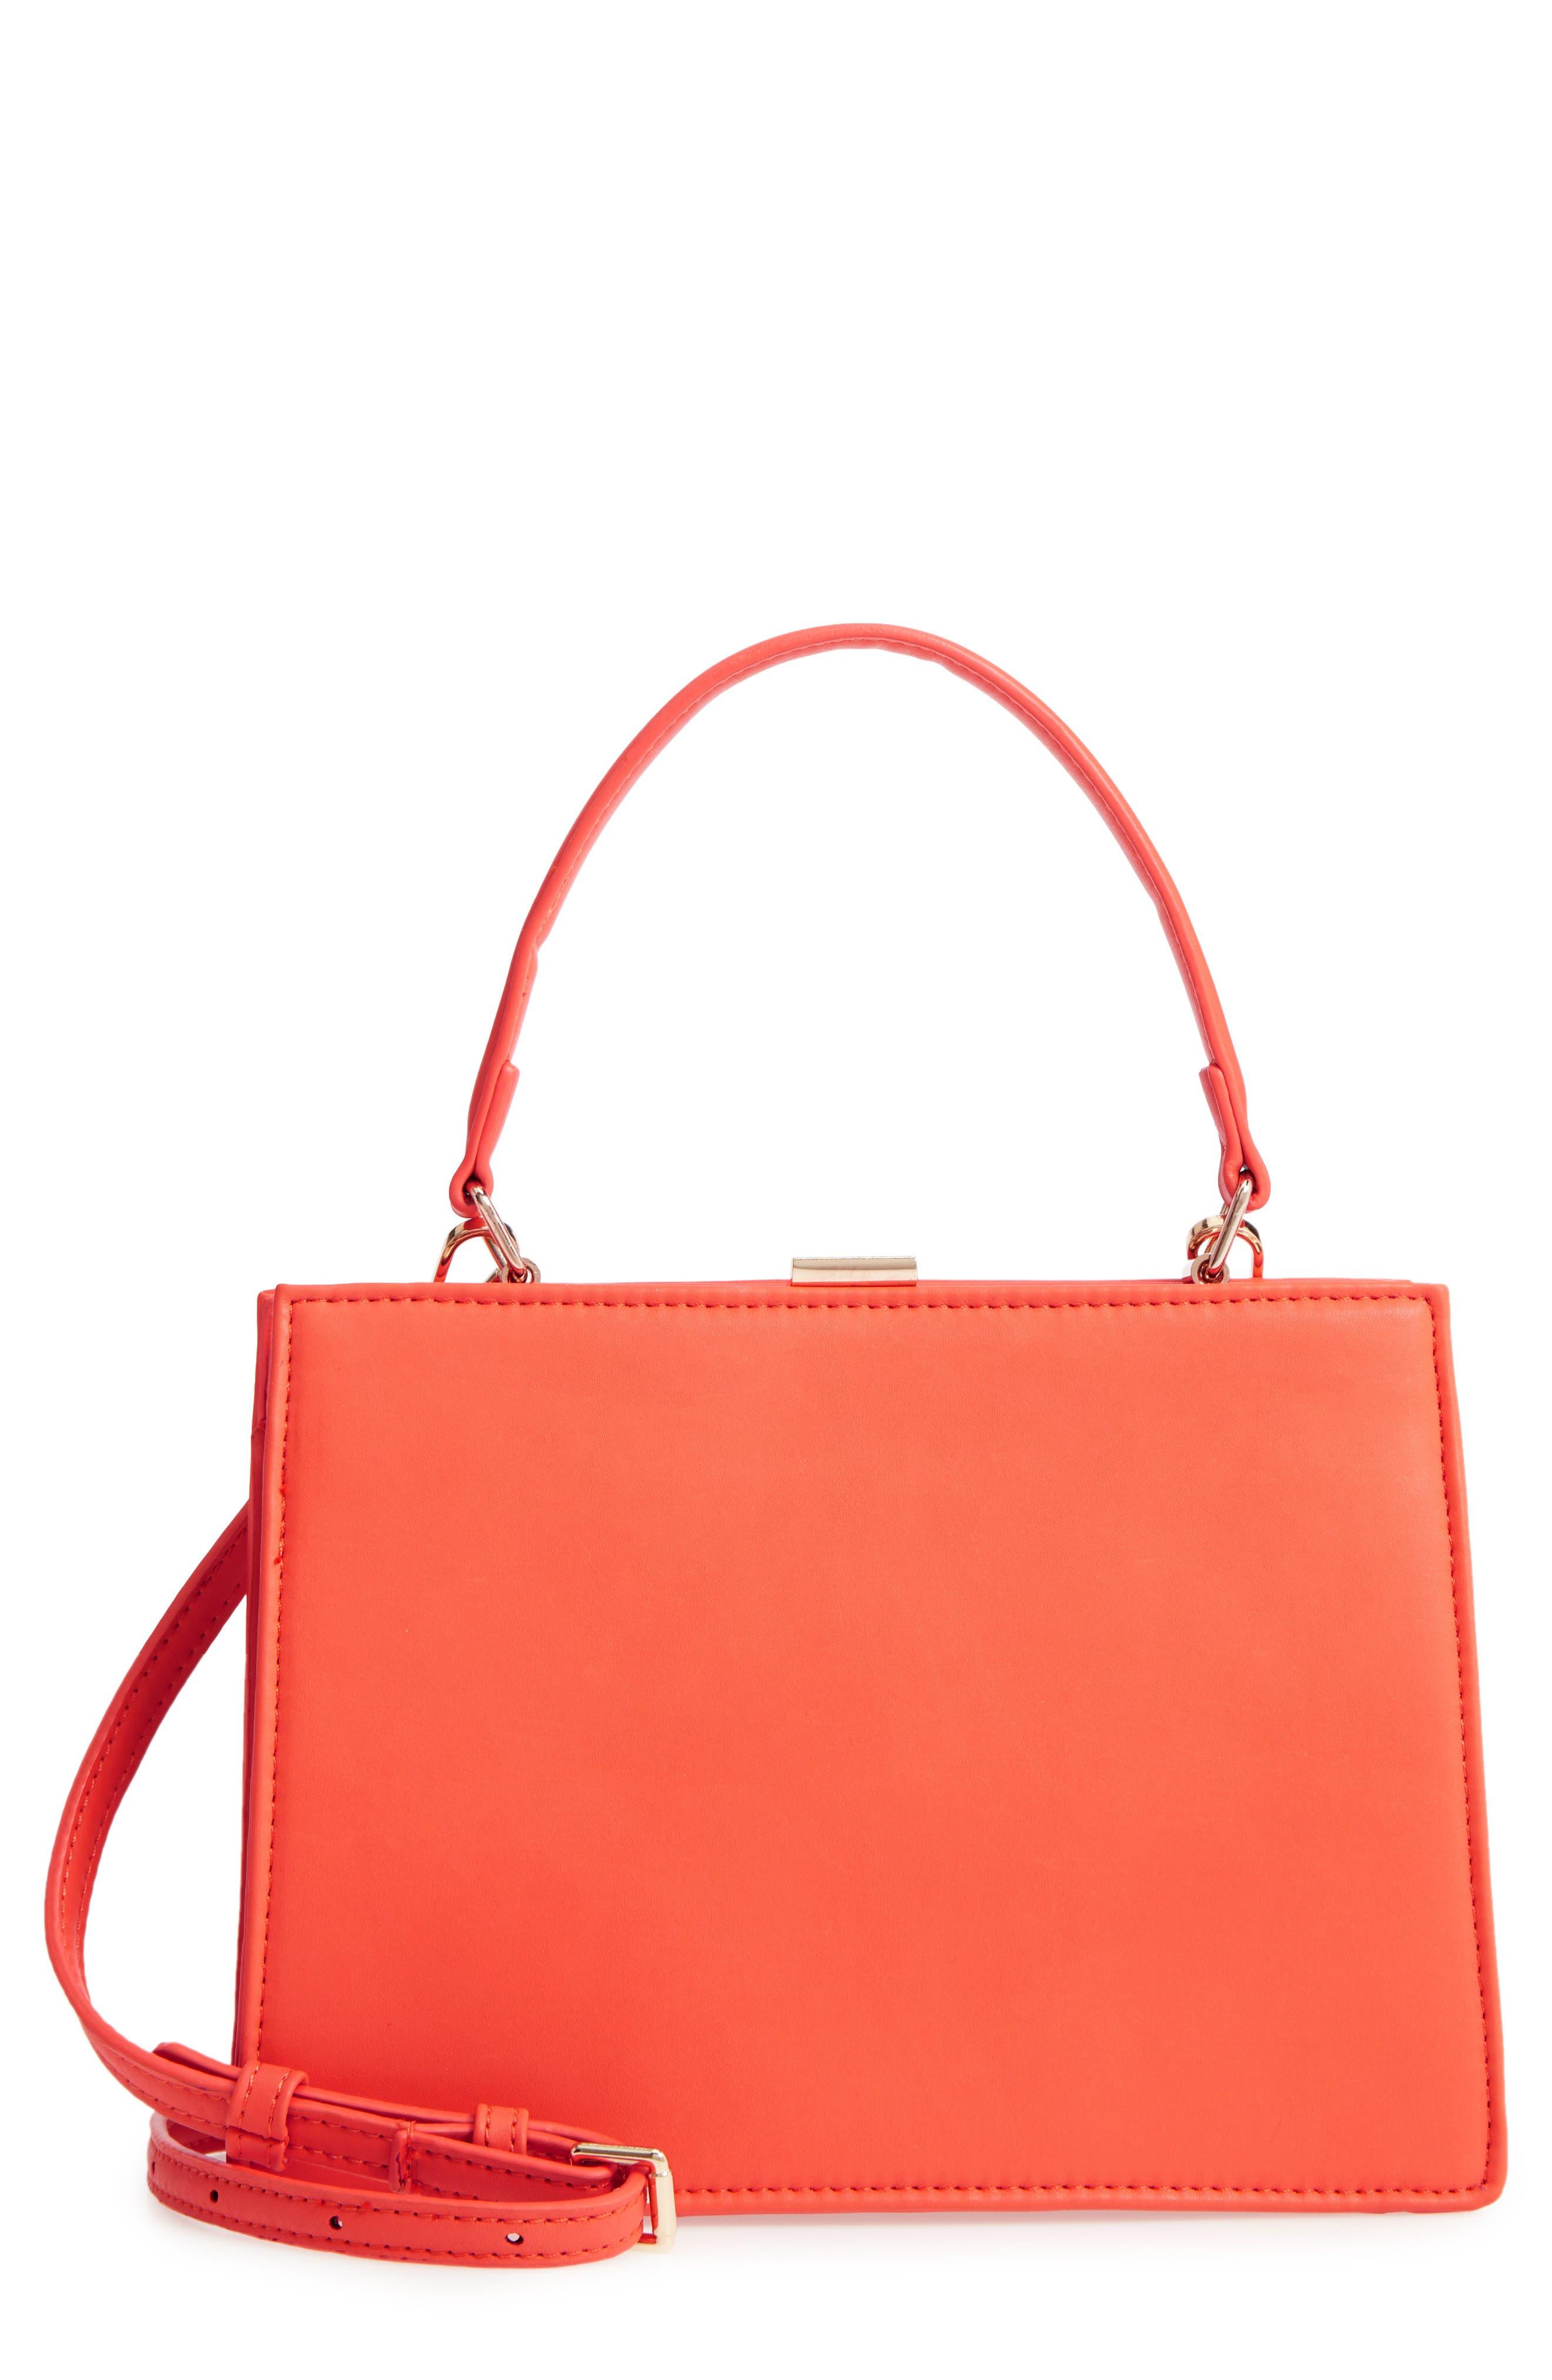 Faux Leather Frame Handbag,                             Main thumbnail 1, color,                             Red